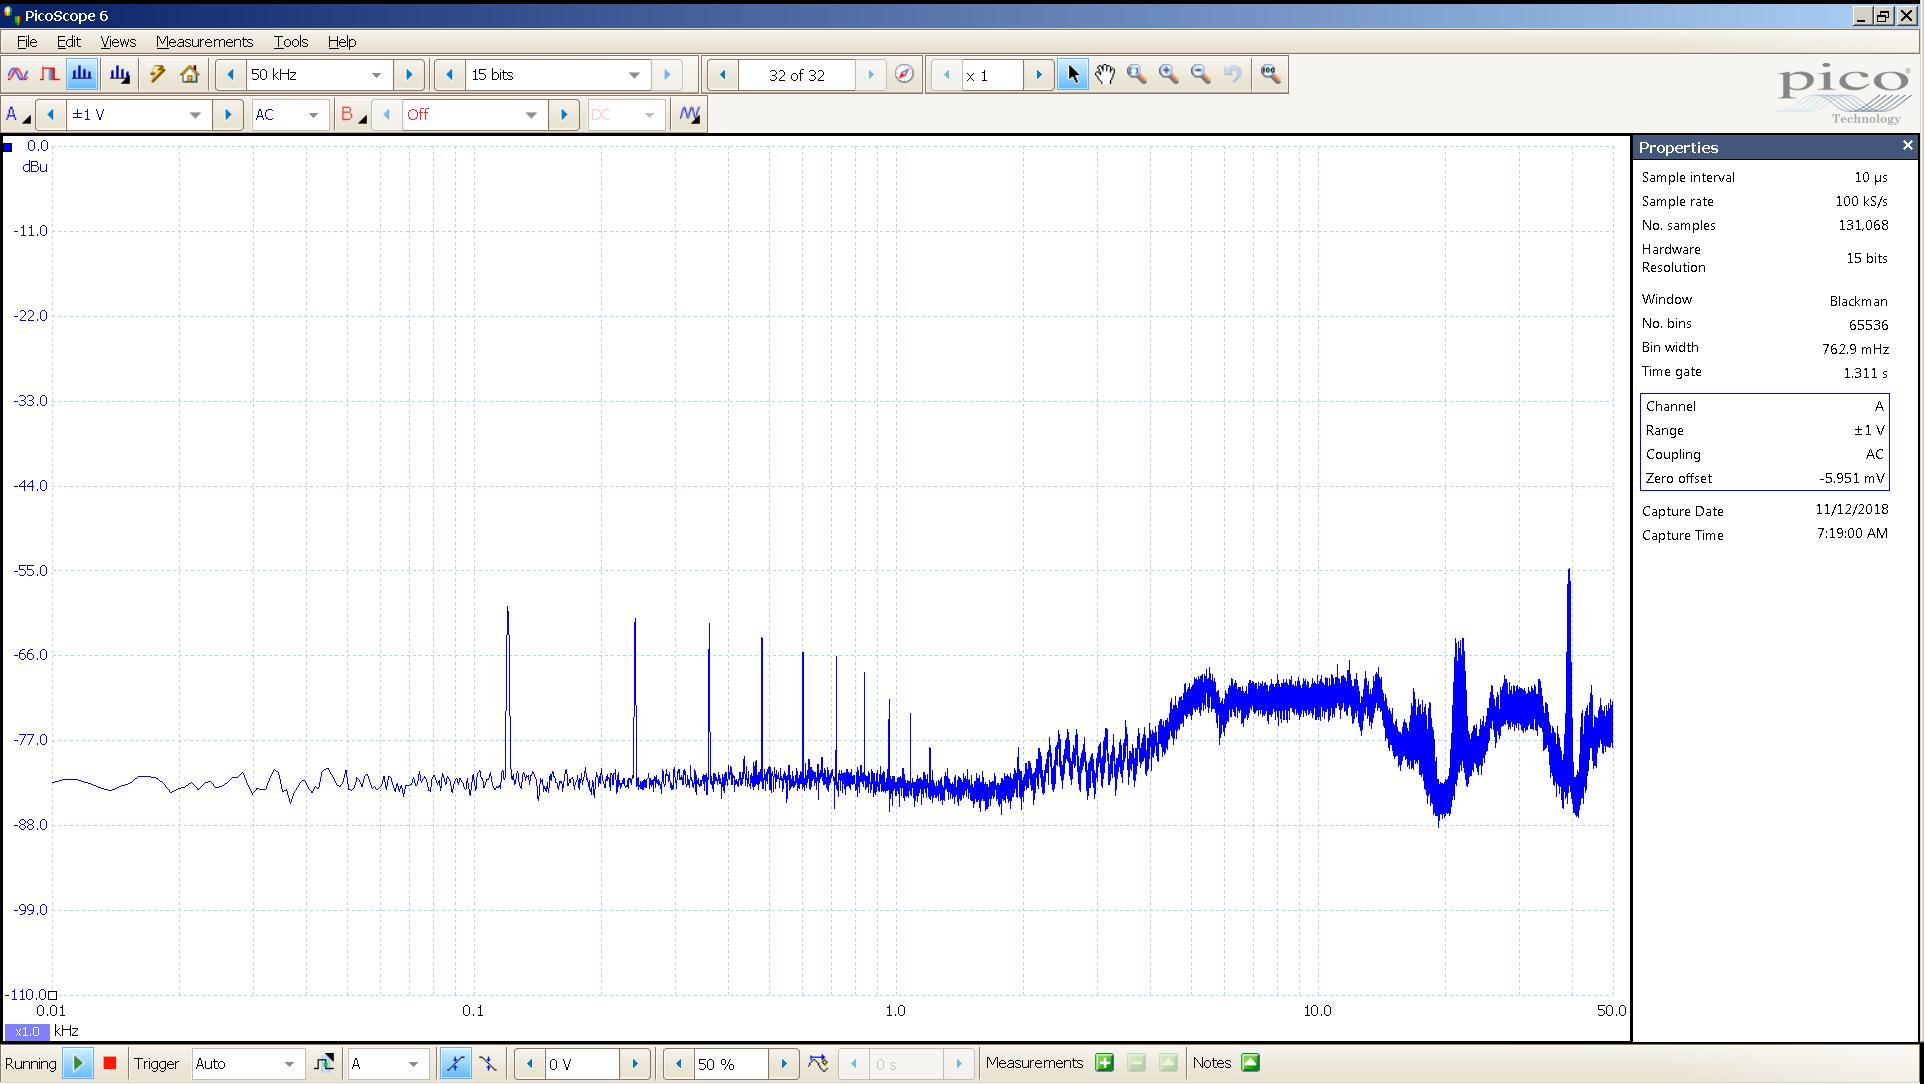 20181112-45 36V 56R residual noise 200mV FFT 10Hz - 50KHz - SMPS.png